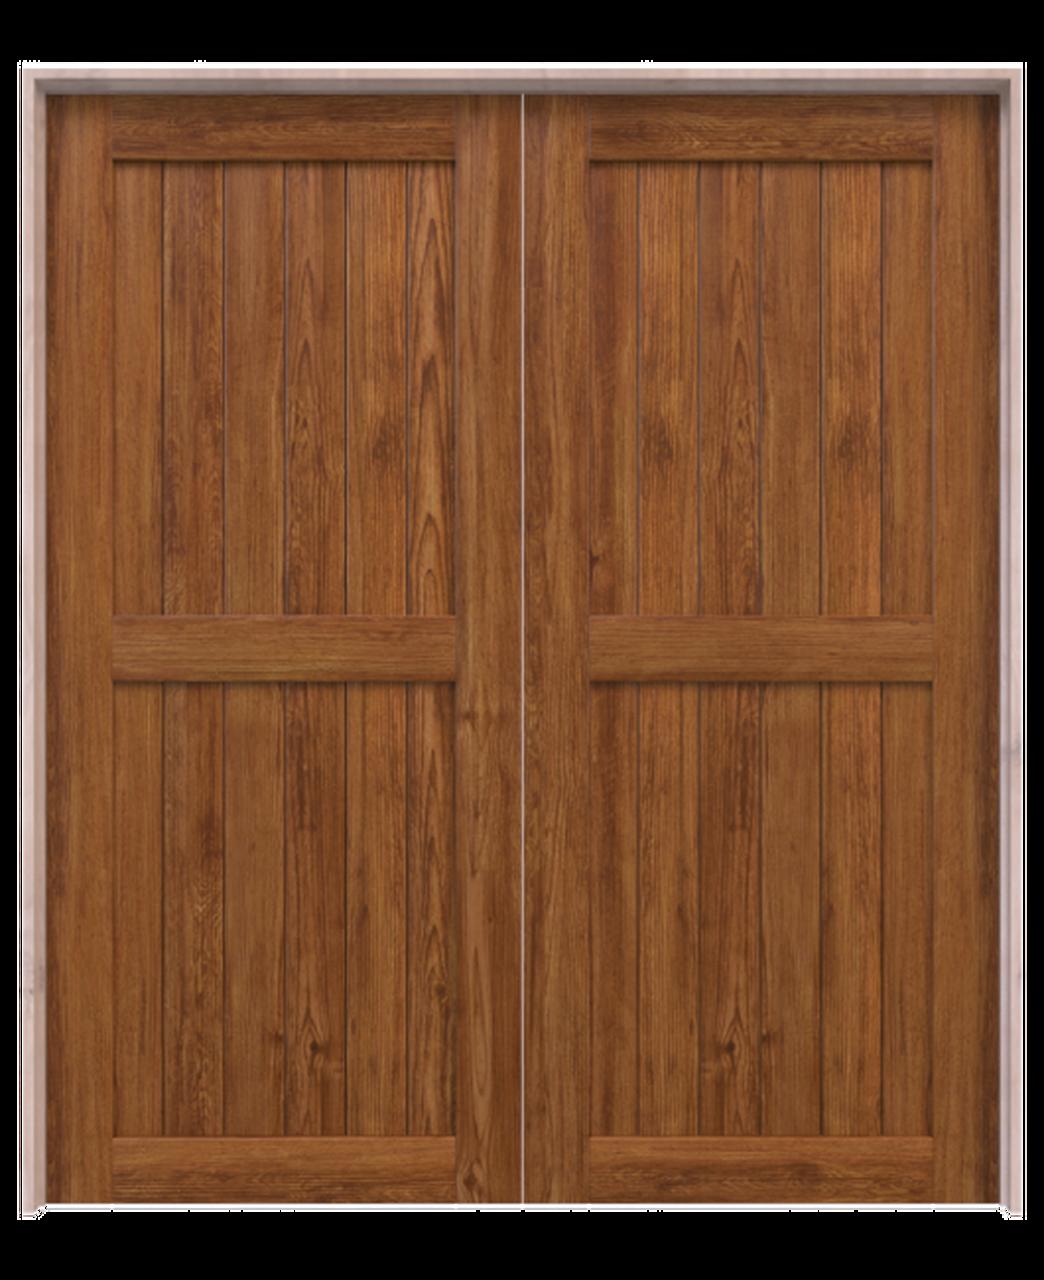 naples stained wood 2 panel double barn door